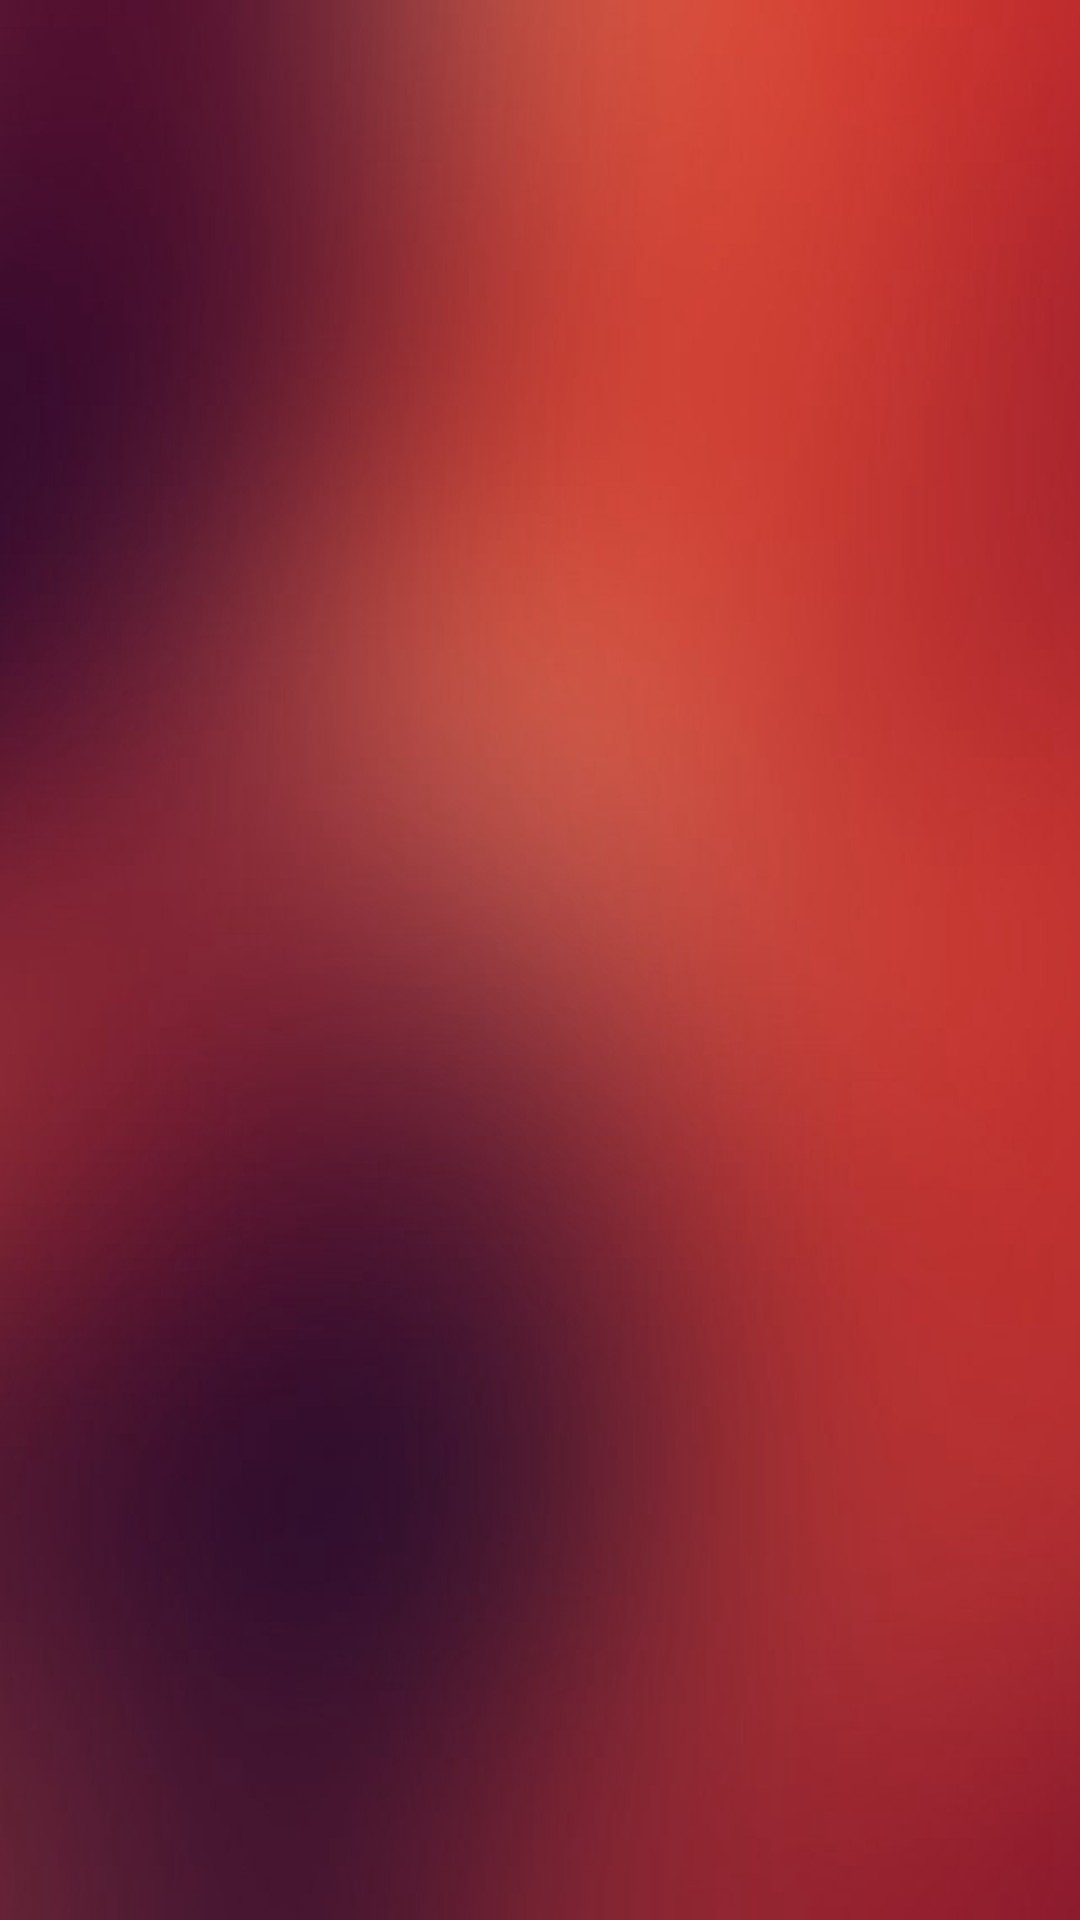 Orange Warm Hot Gradation Blur #iPhone #6 #plus #wallpaper